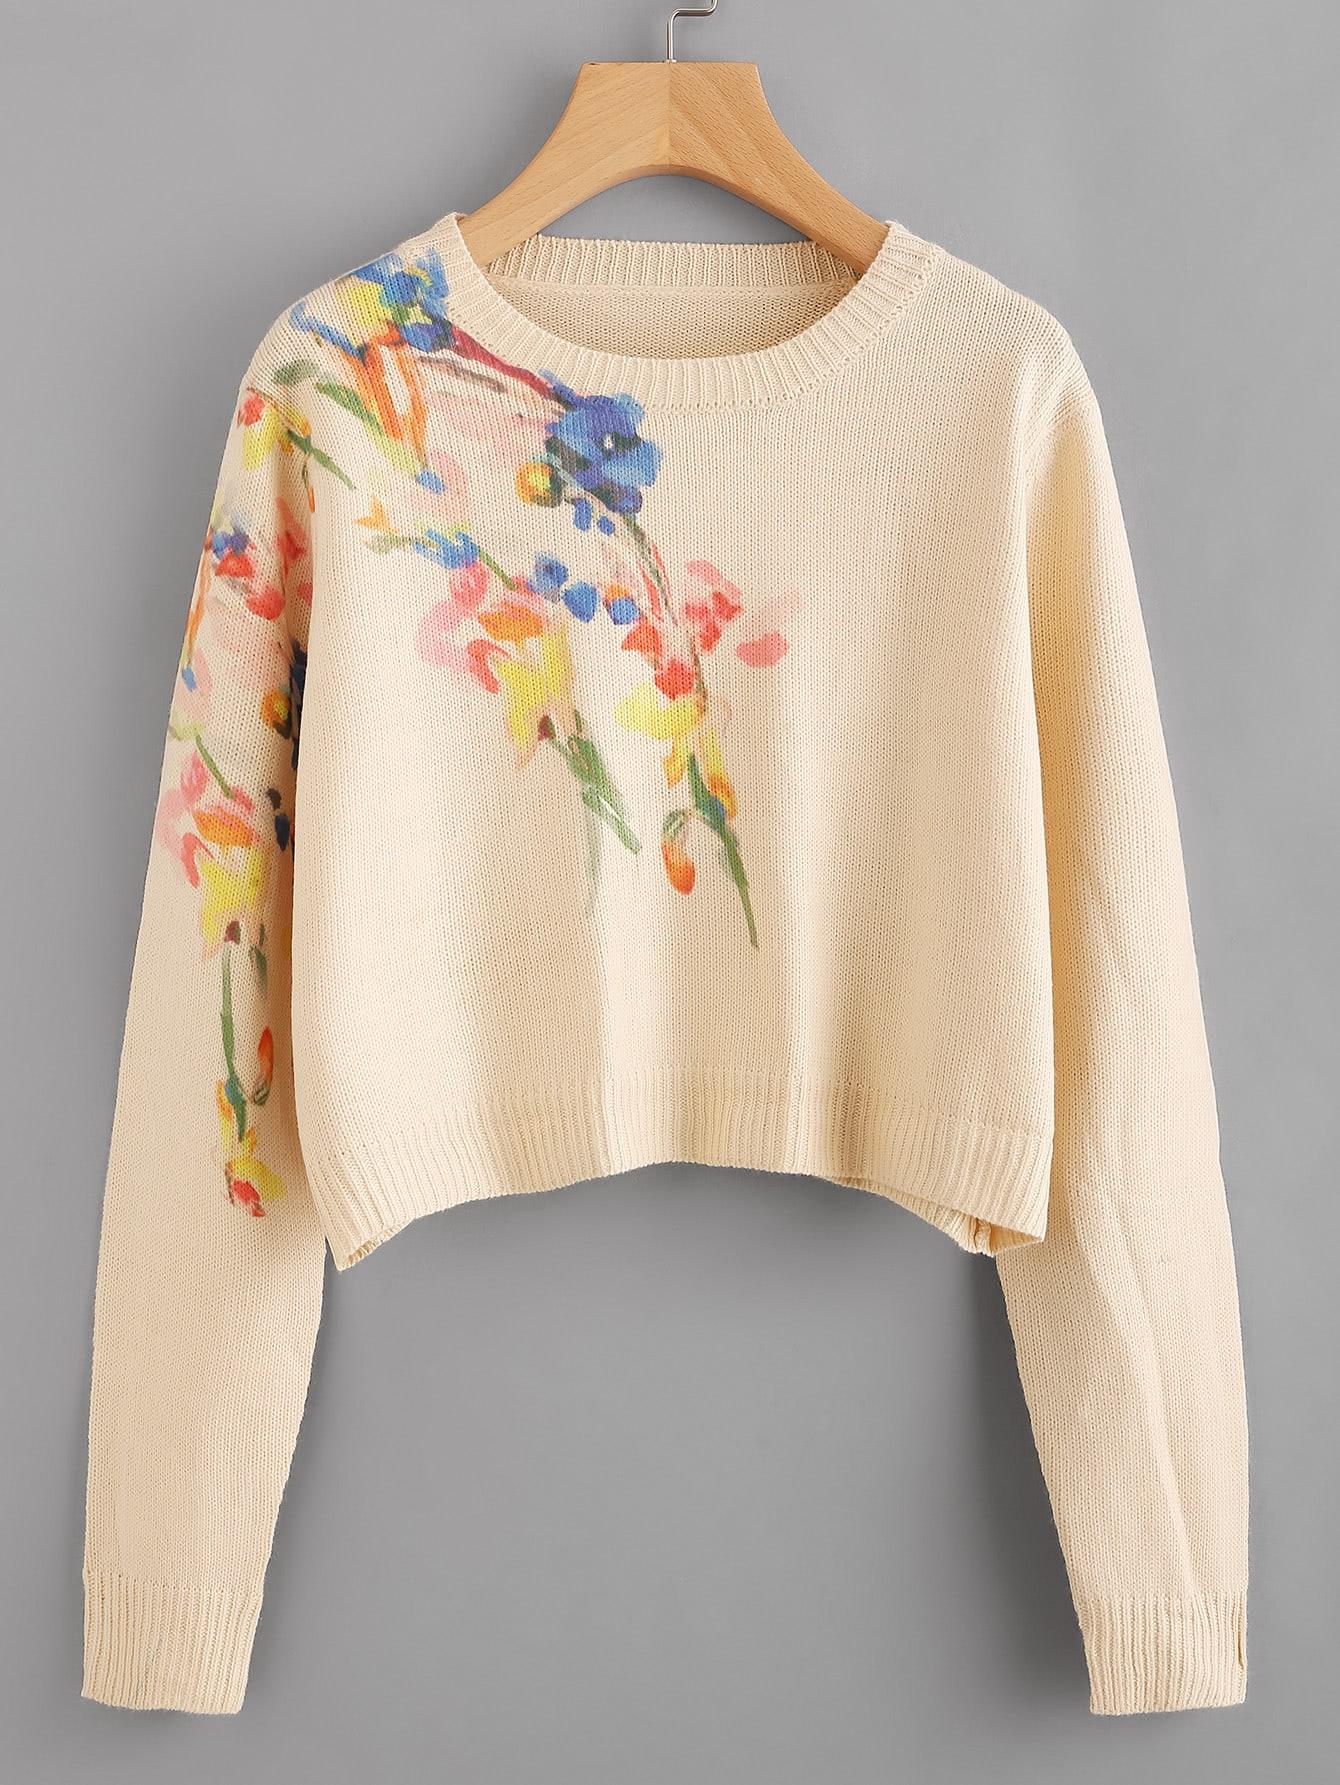 Flower Print Crop Jumper sweater170710474